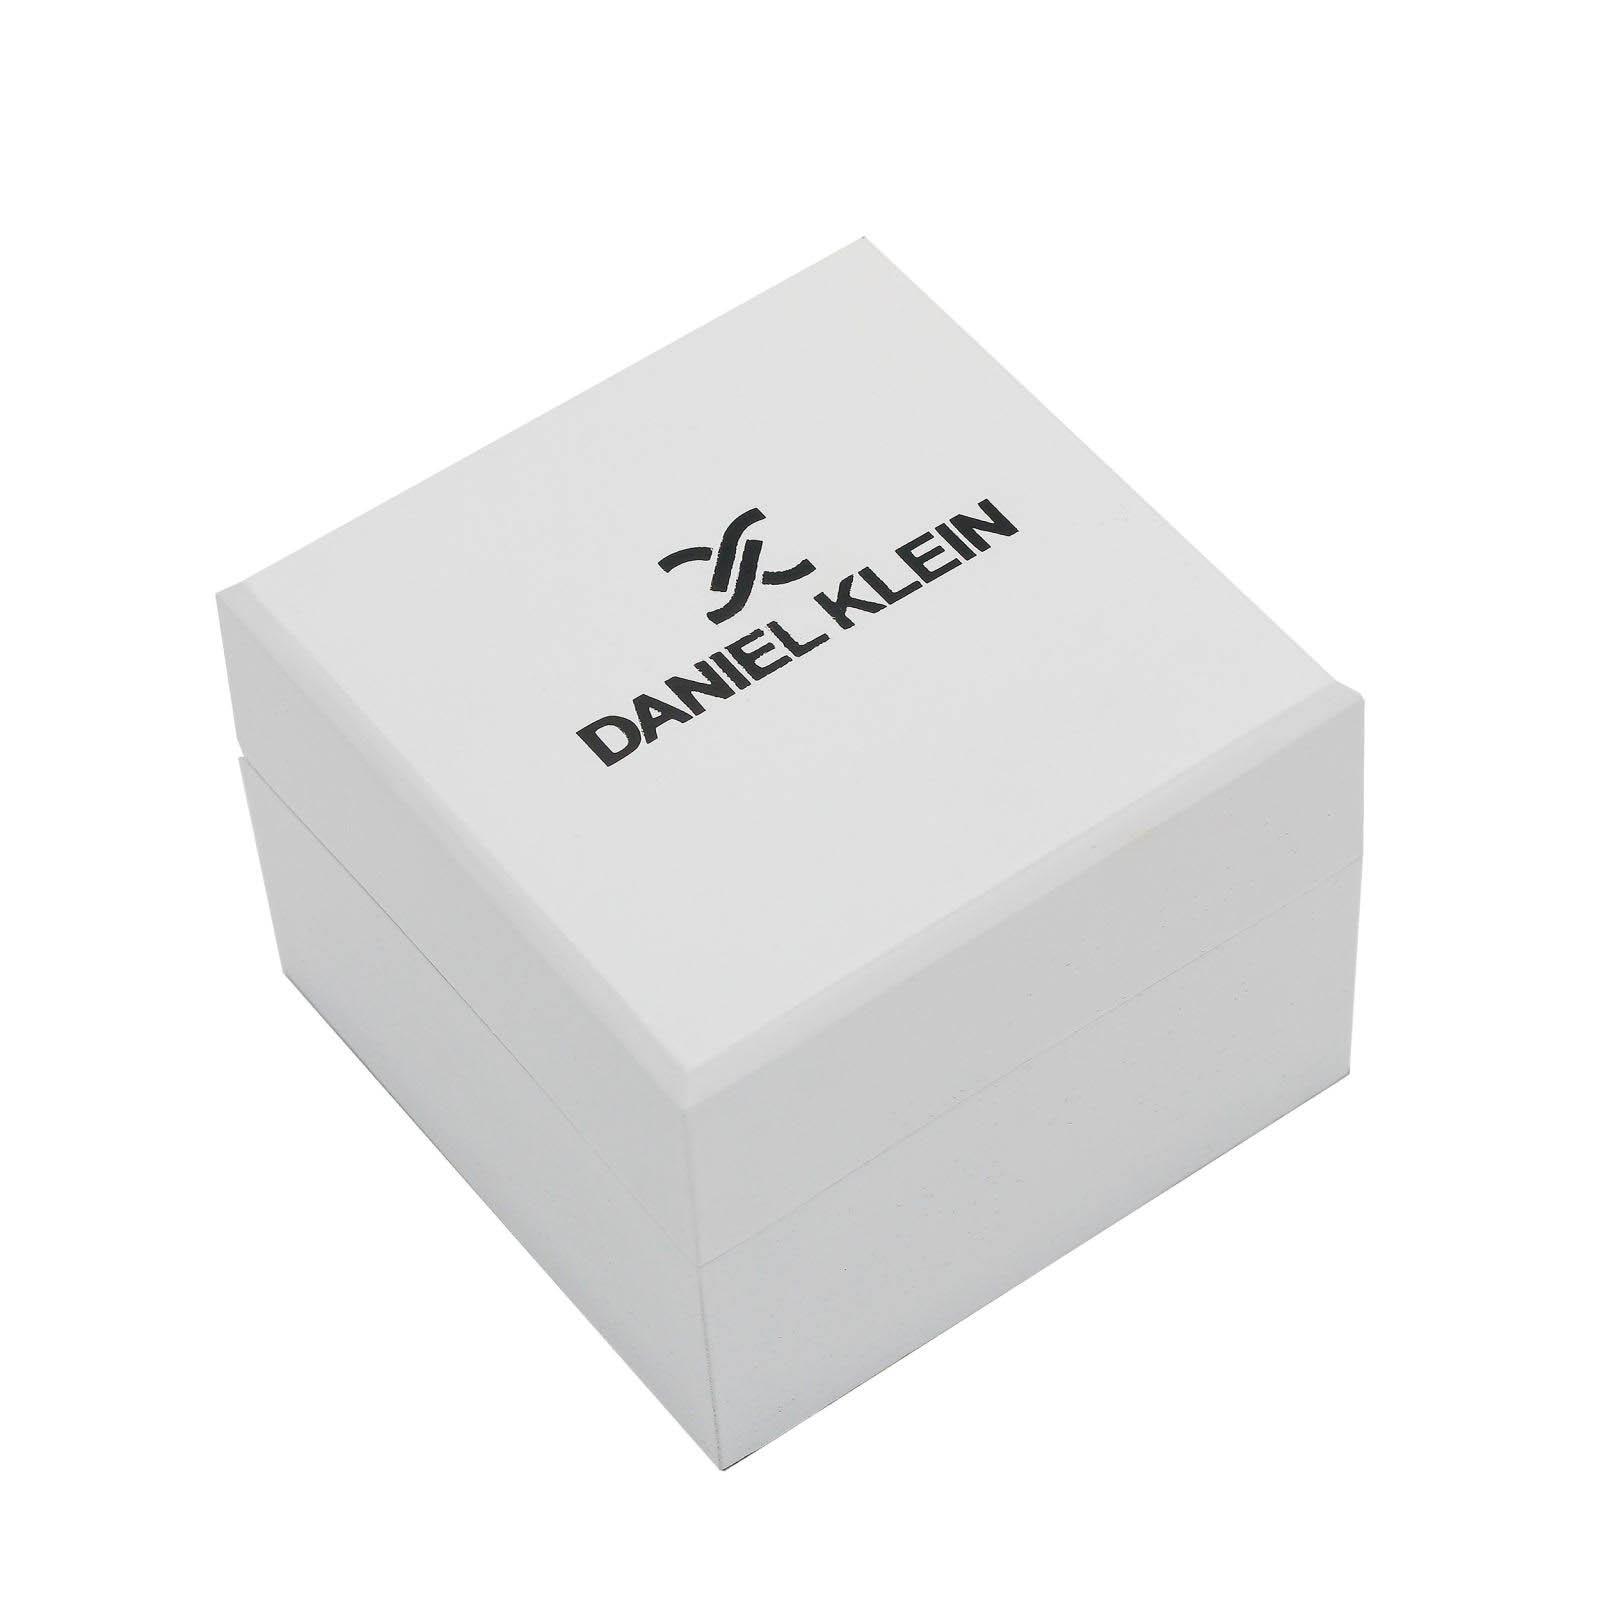 ساعت مچی عقربهای مردانه دنیل کلین مدل 8.6DK.1.1244